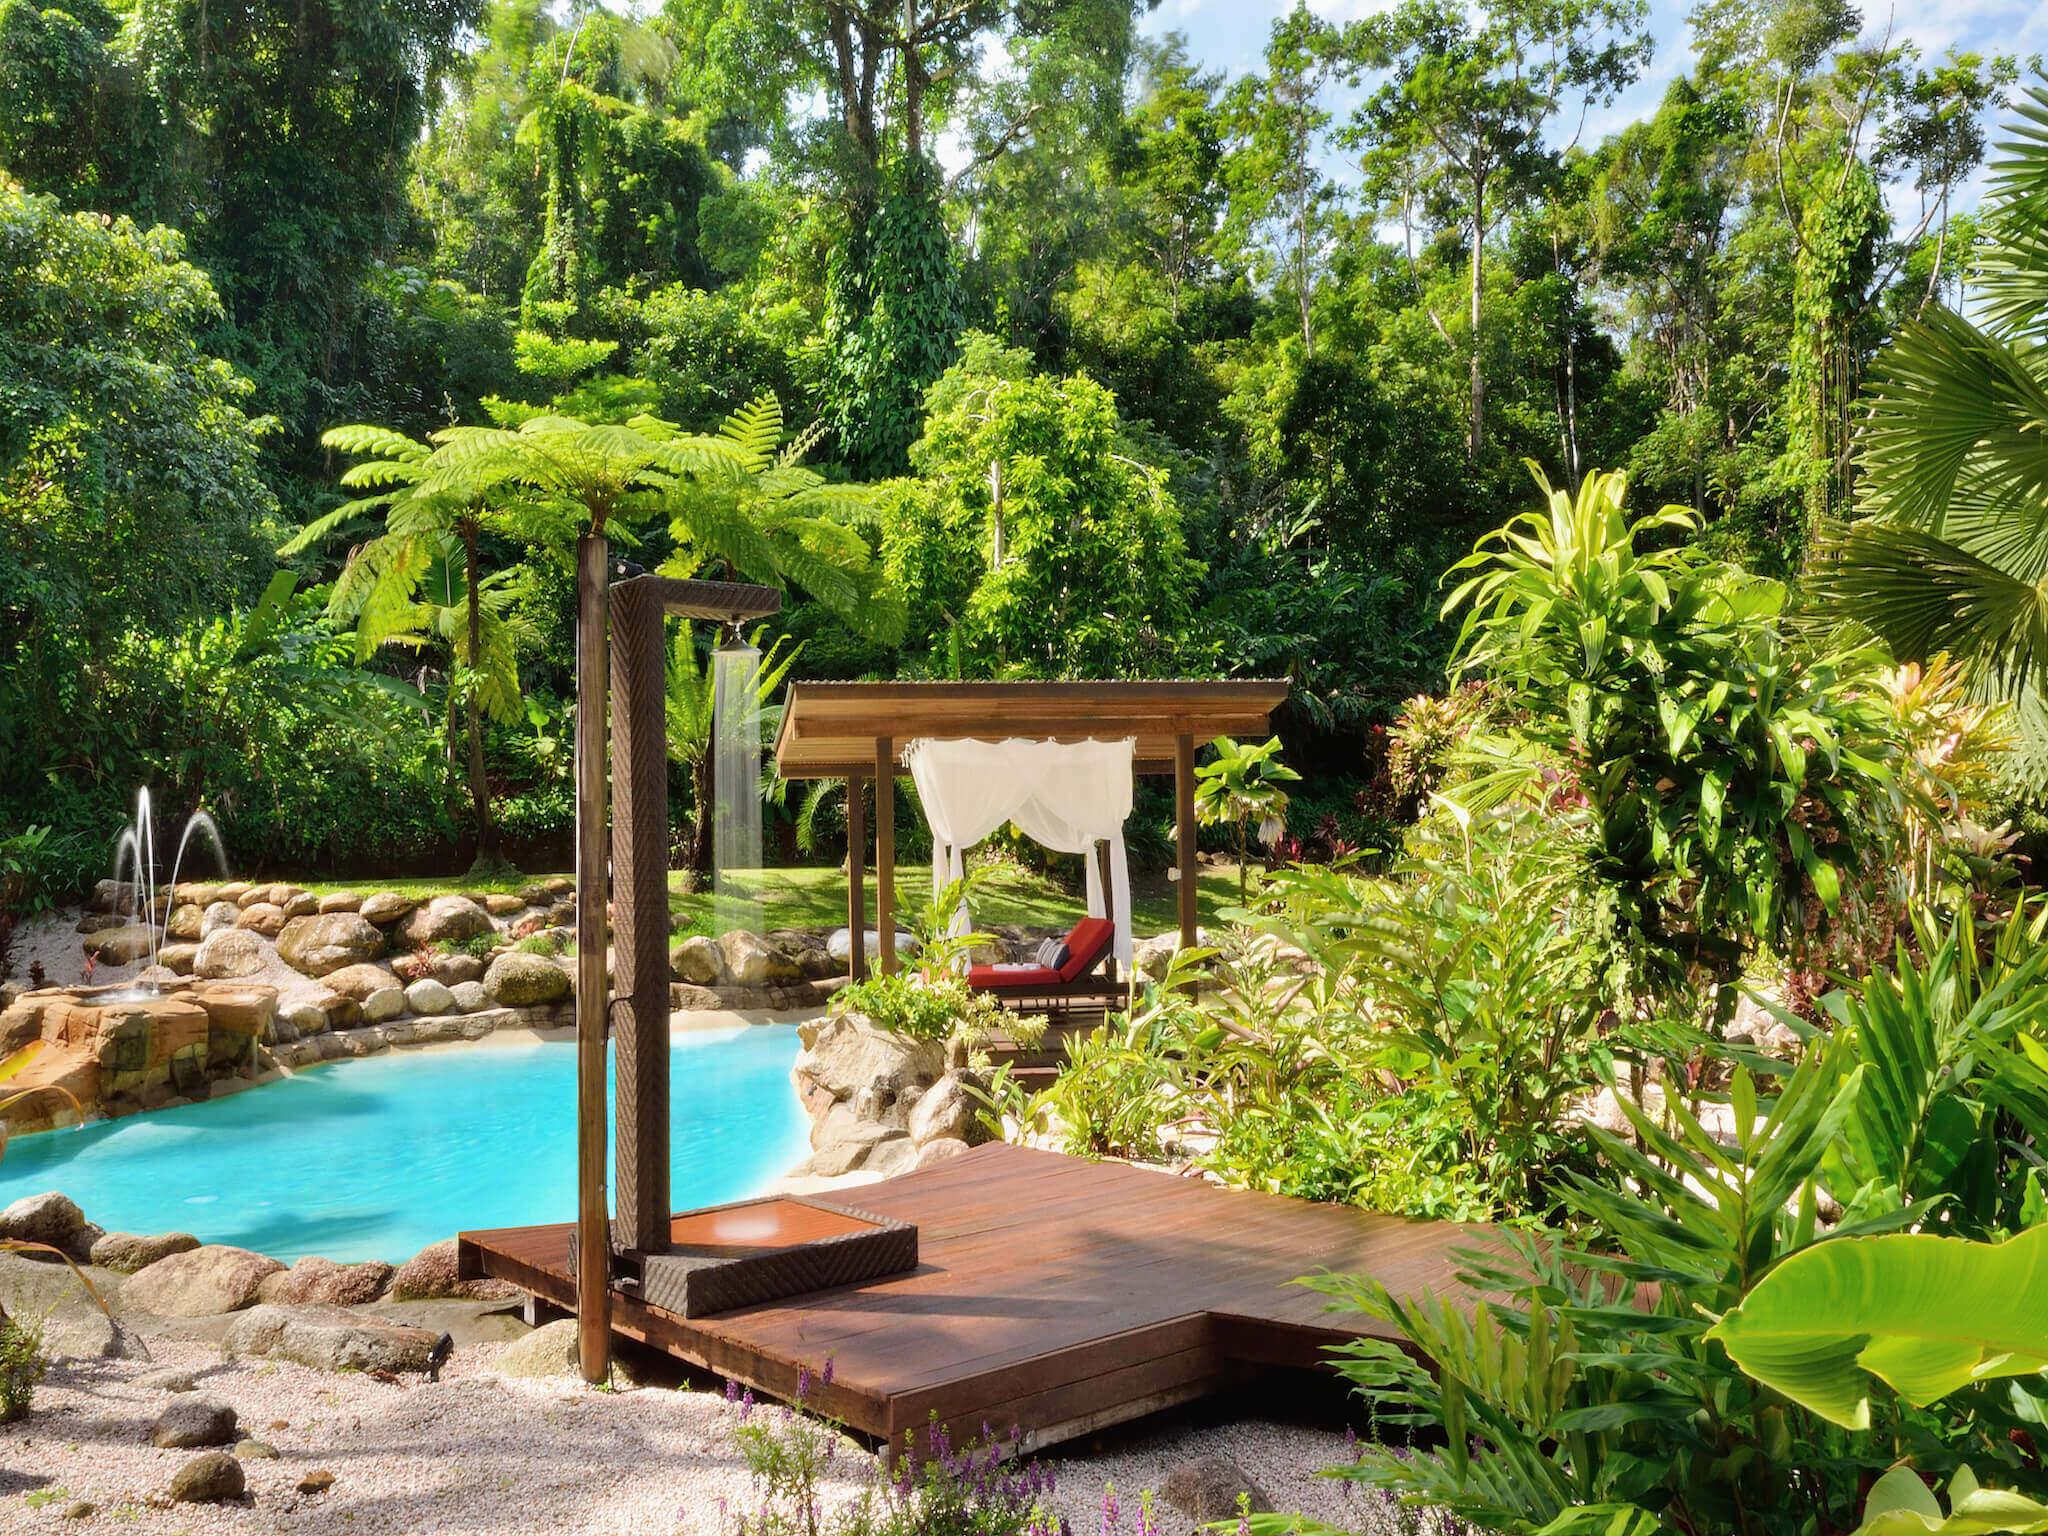 wedding and honeymoon destinations australia